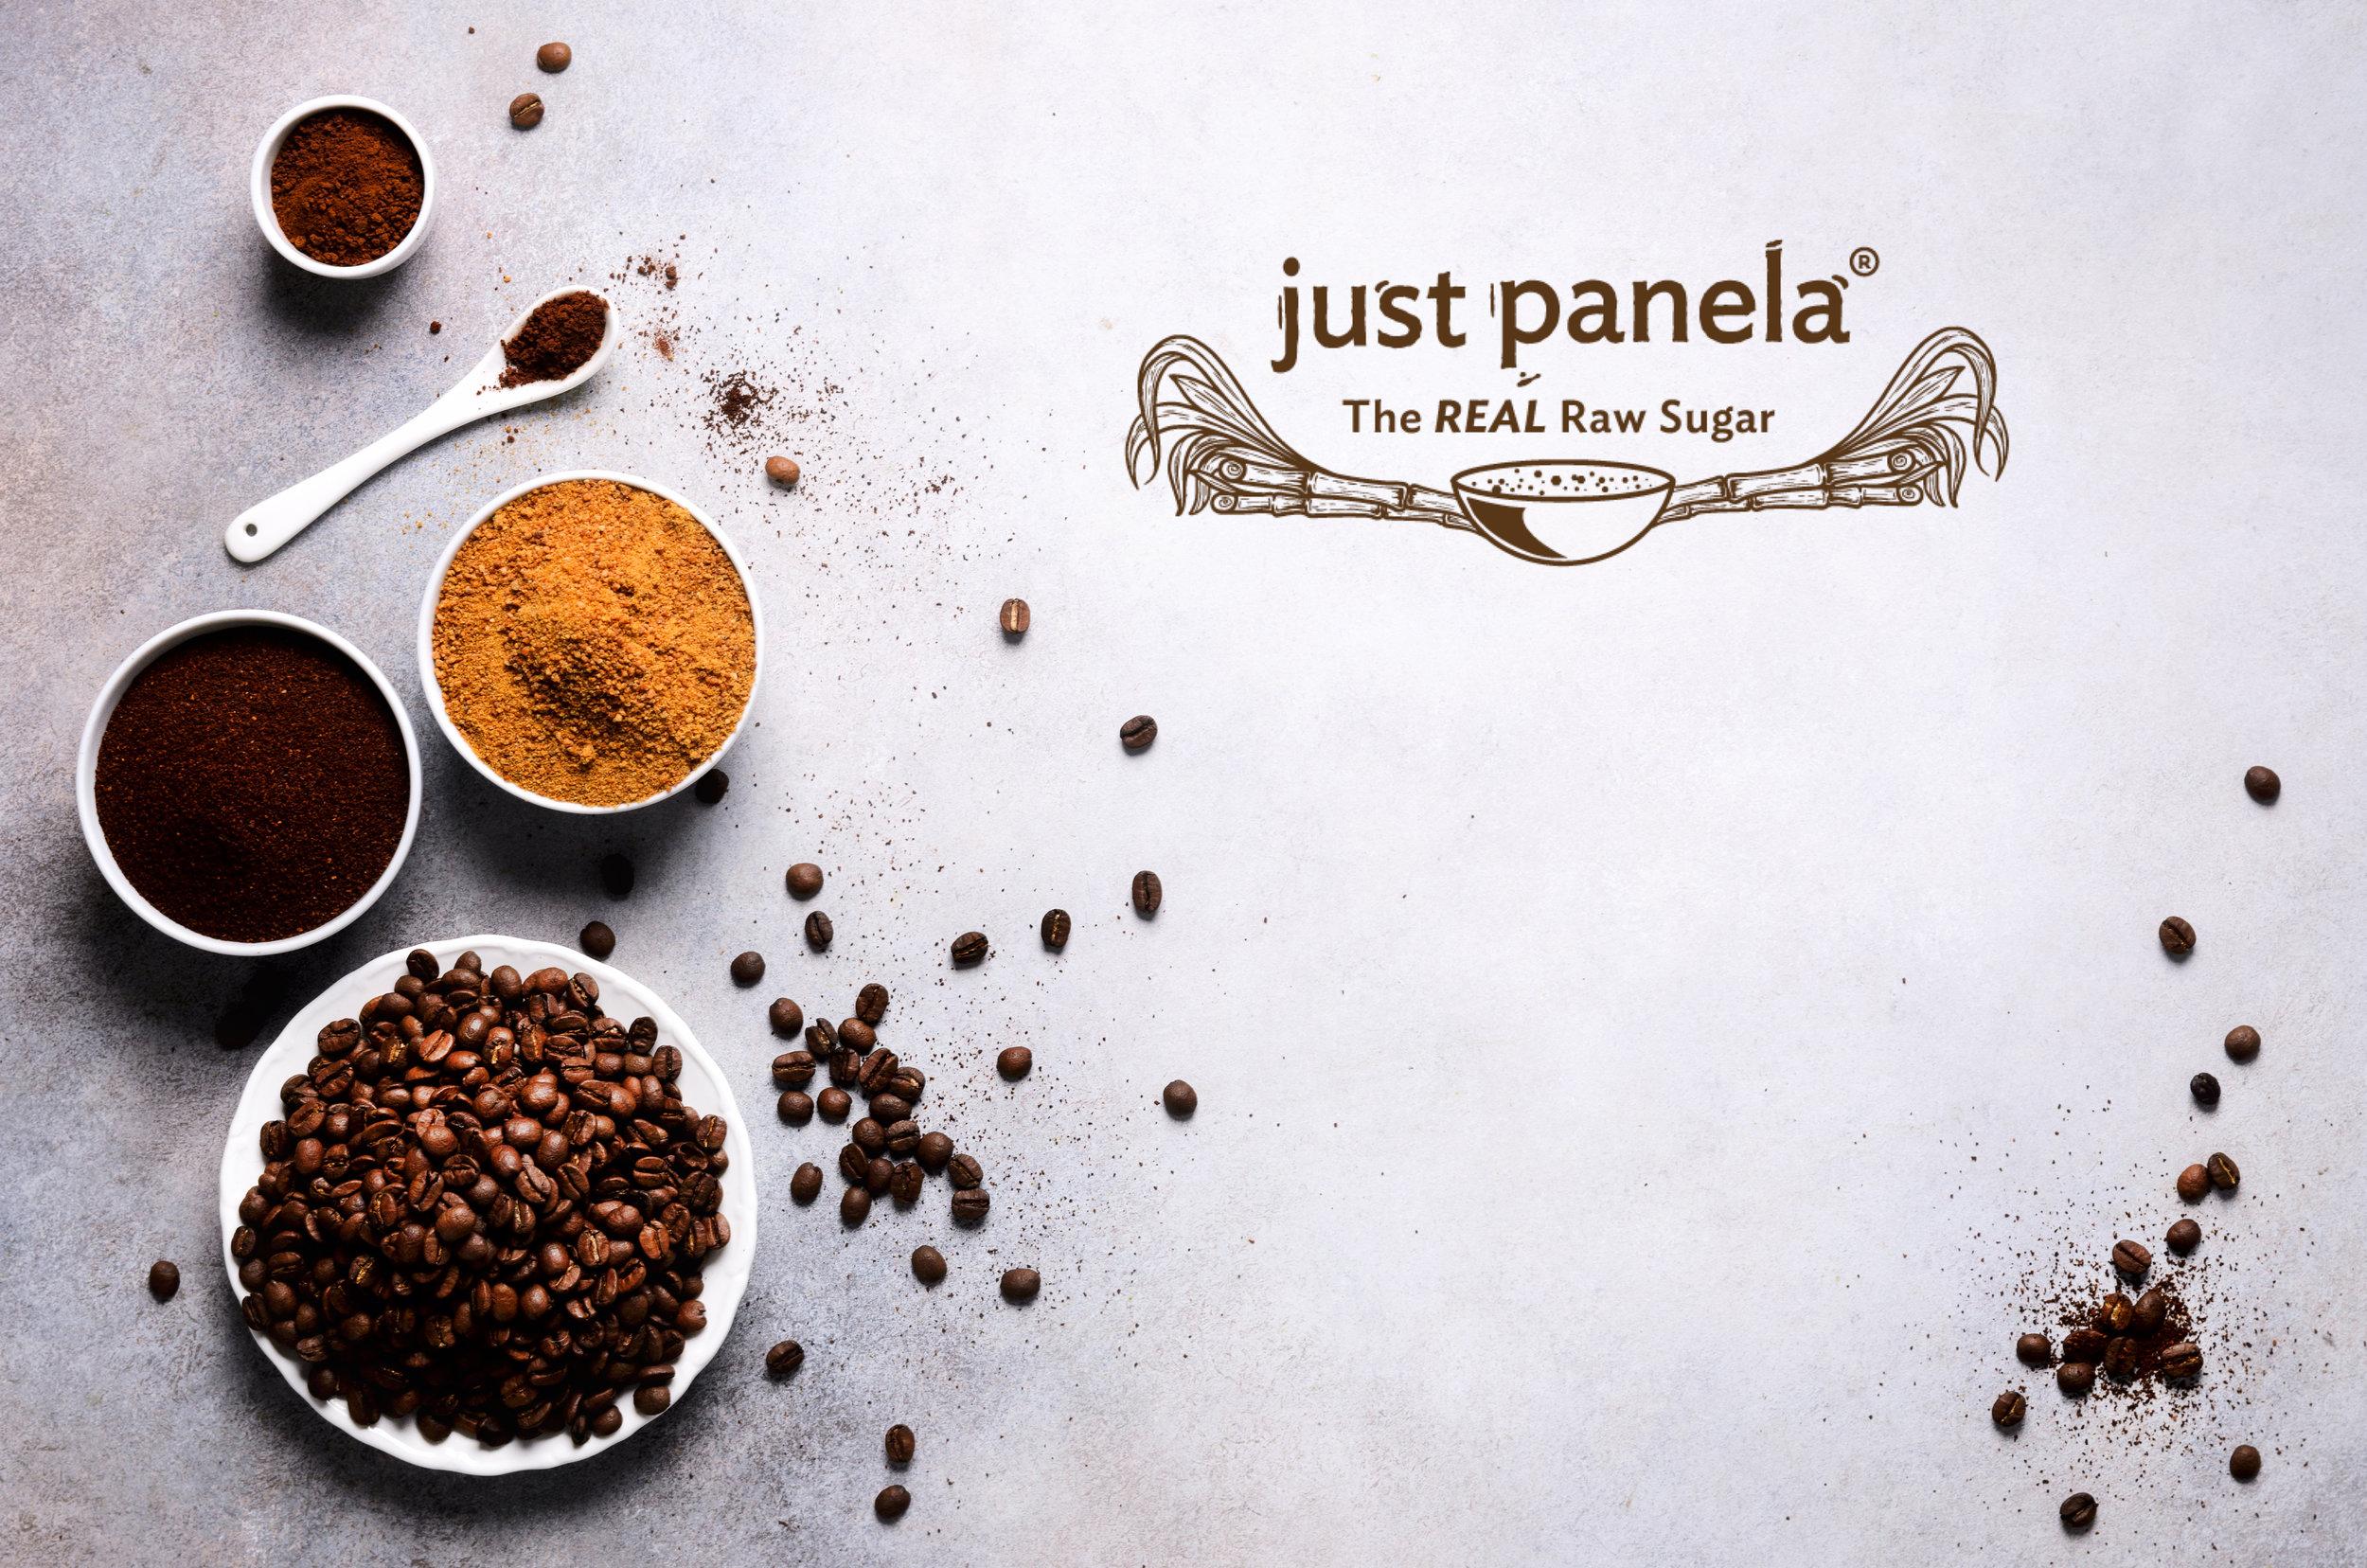 Branded Coffee and Panela.jpg